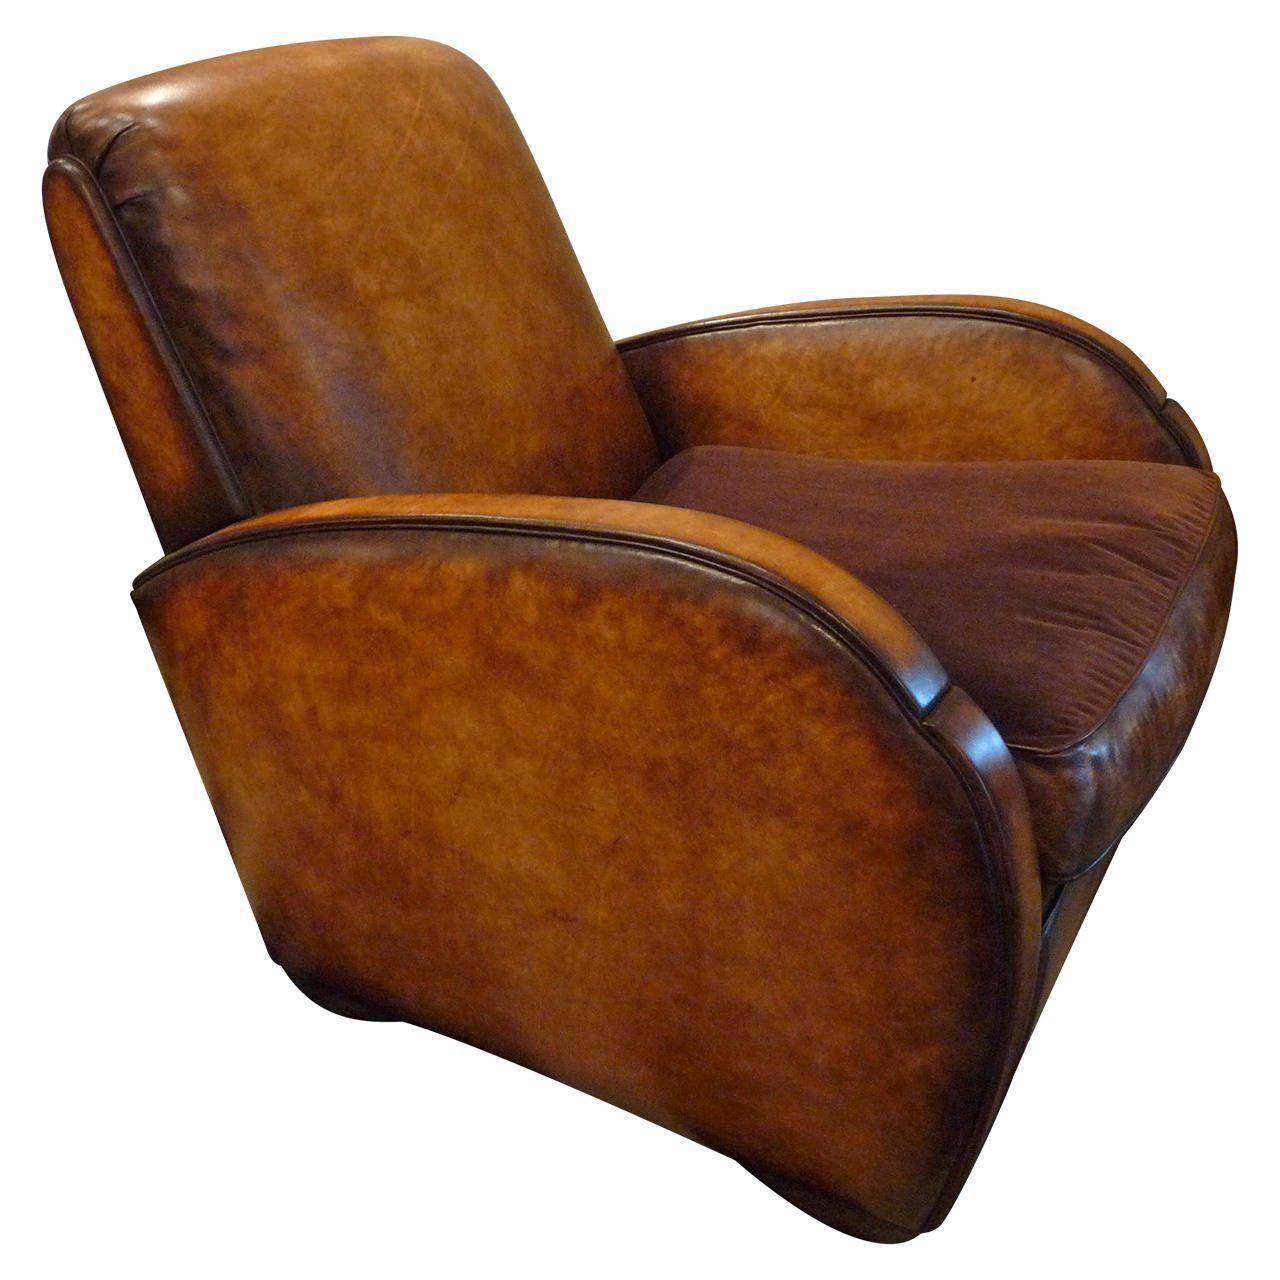 Art deco vintage leather sofa armchair - Leather Lounge Paris Club Chair From A Unique Collection Of Antique